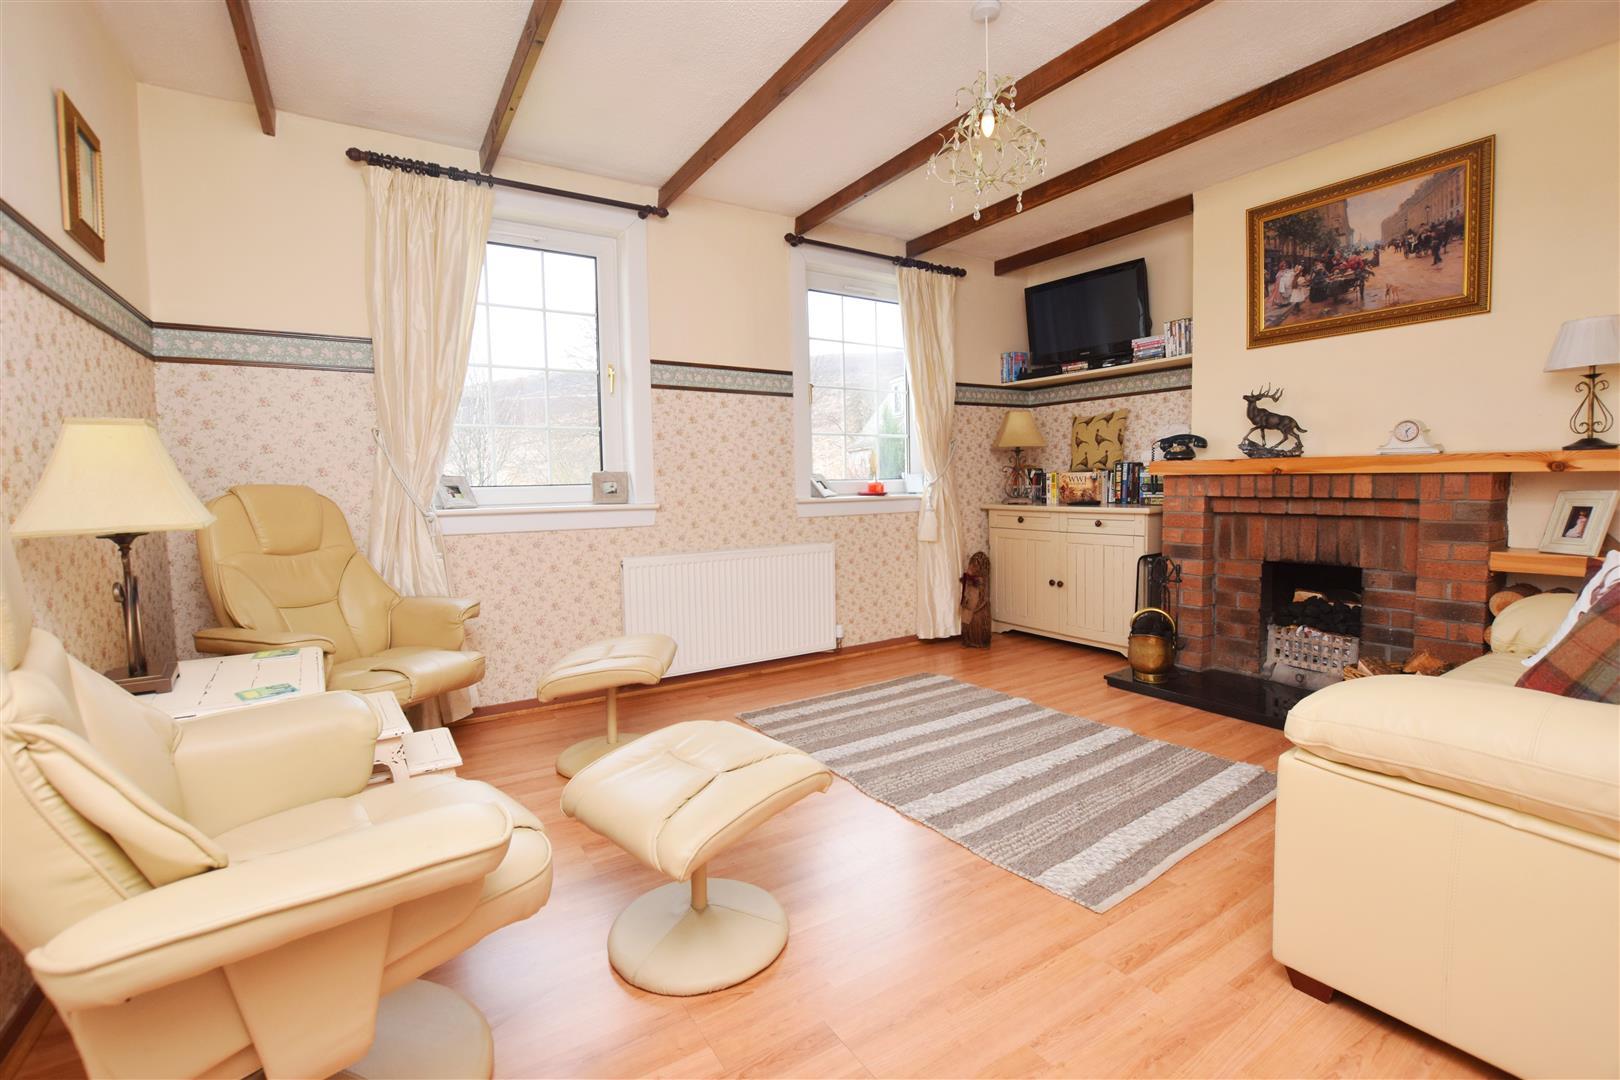 3 Drumcroy, Trinafour, Pitlochry, Perthshire, PH18 5UG, UK